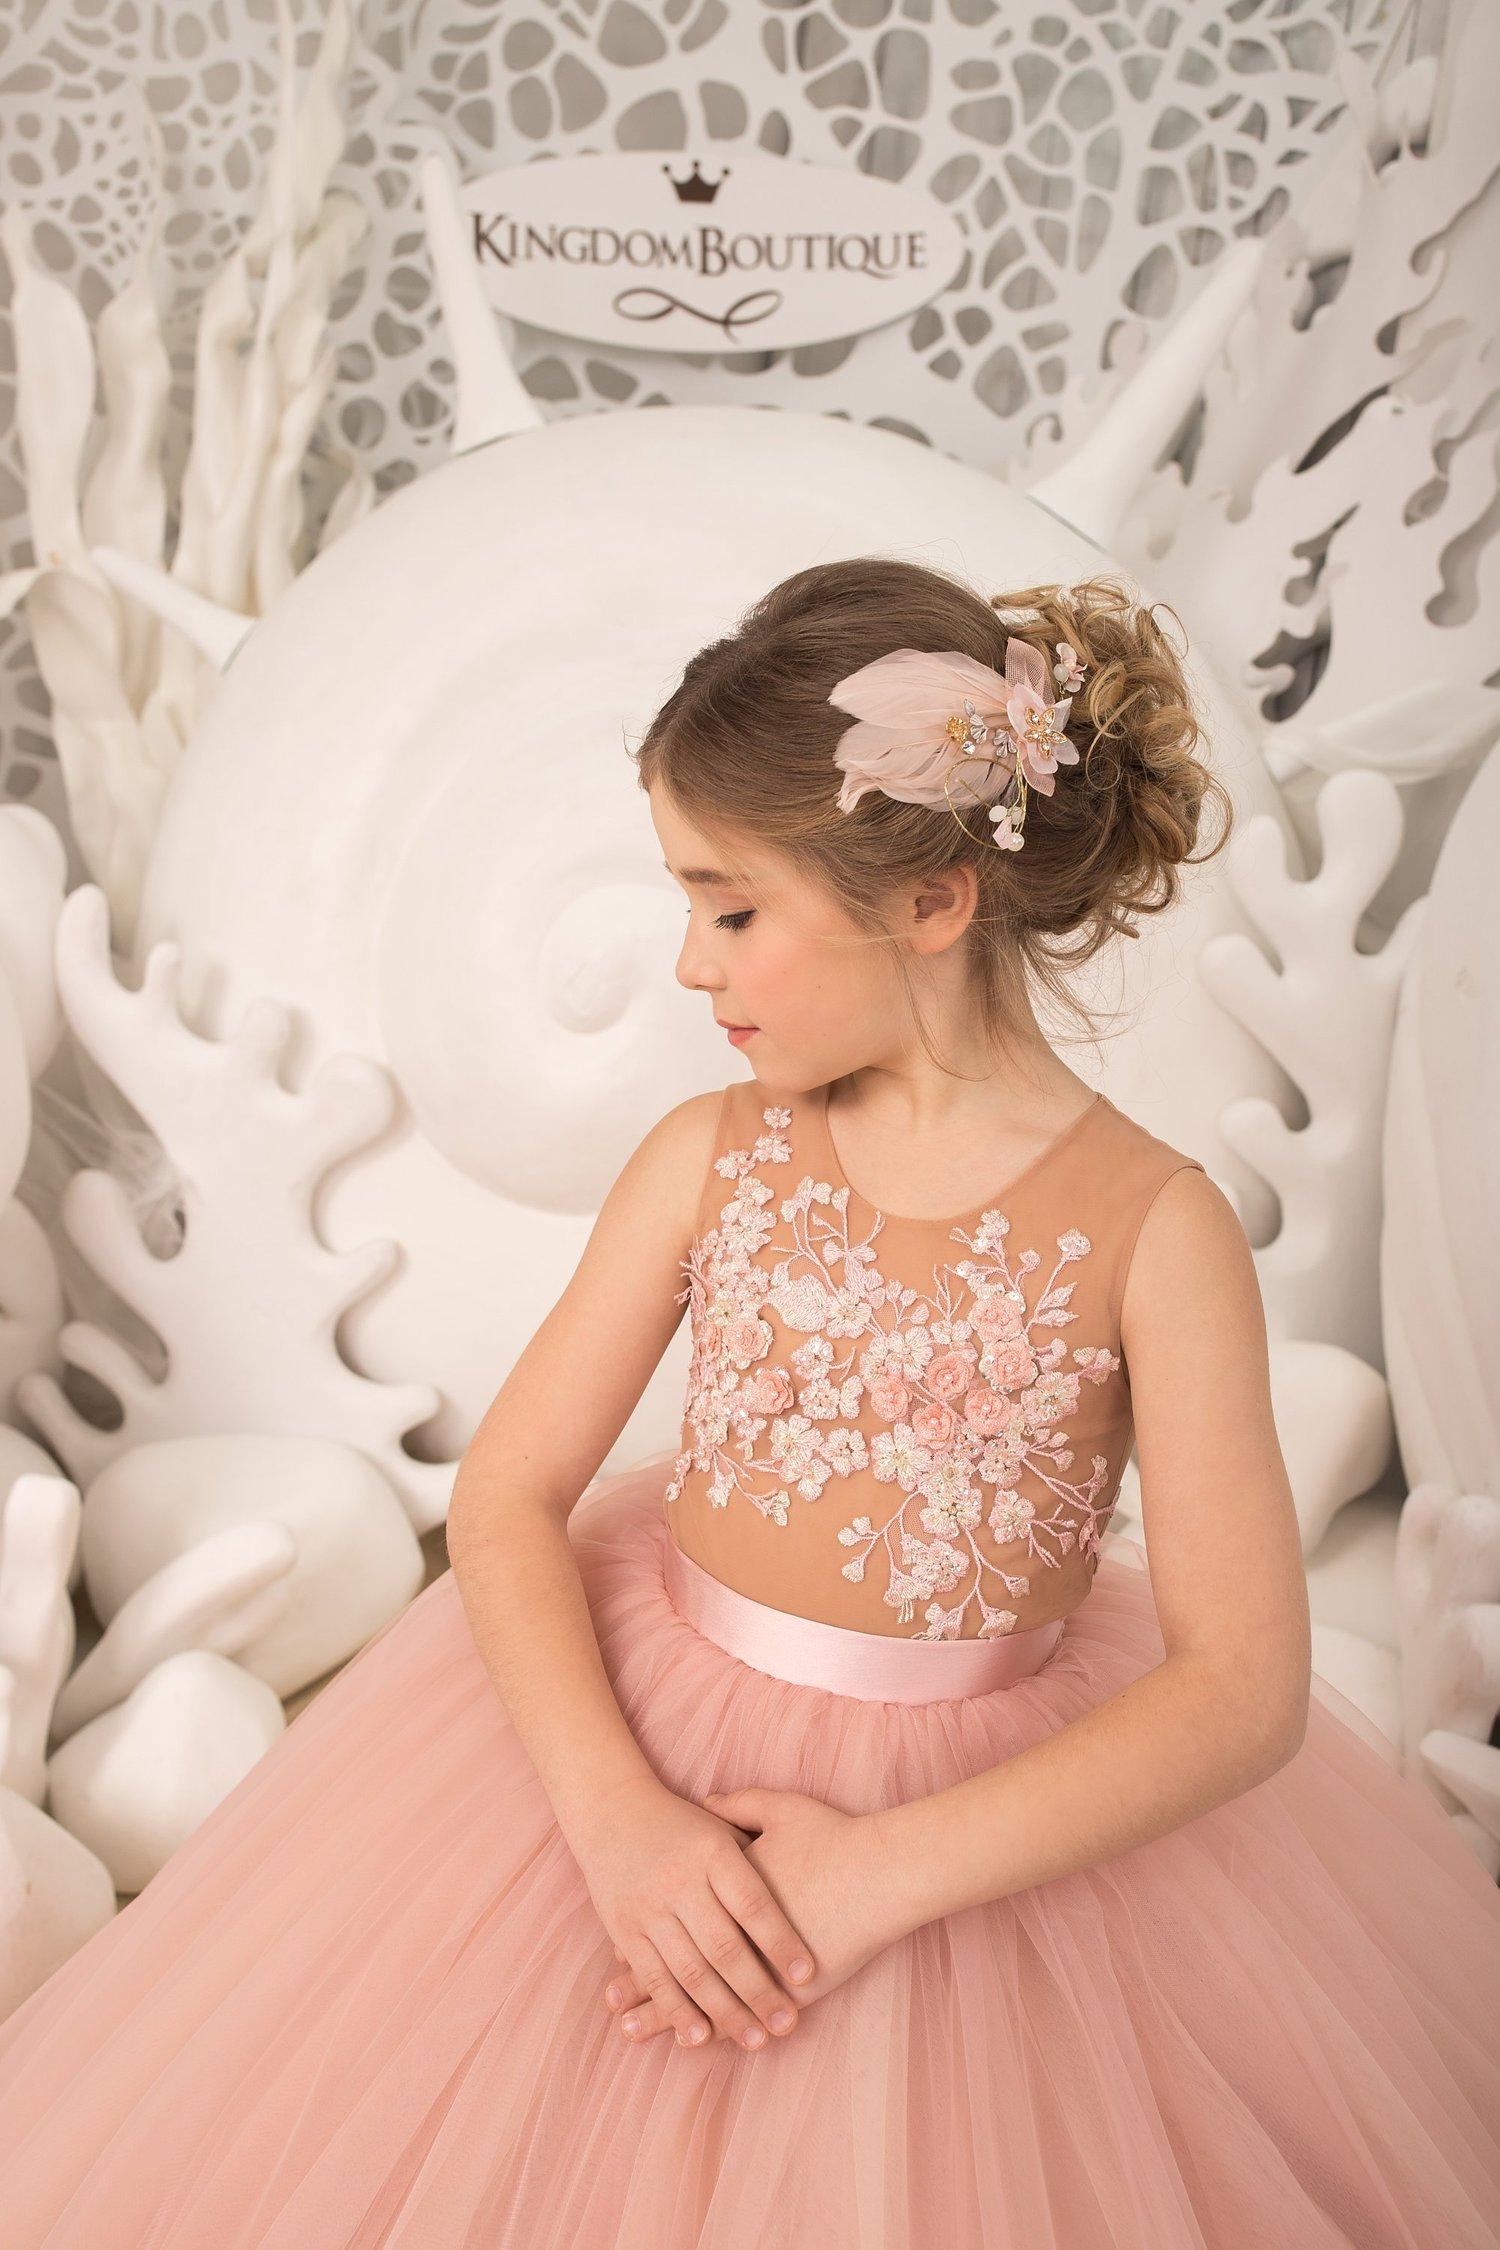 Blush Wedding Blush Dress Blush Flower Girl Dress Tulle Blush Flower Girl Dress Blush Pink Blush Tutu Dress Blush Tulle Dress Blush